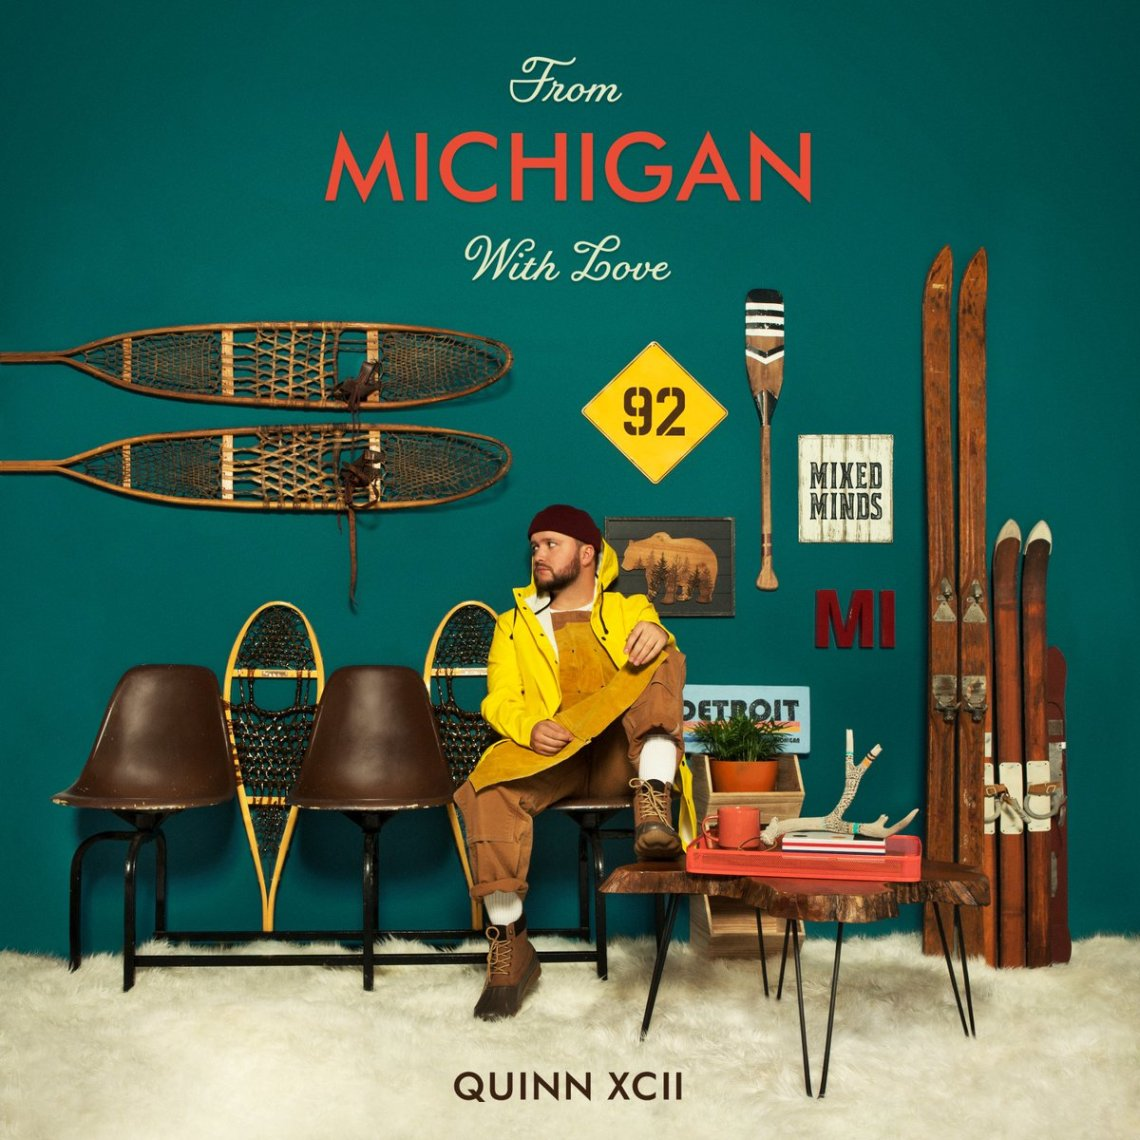 Quinn XCII - From Michigan With Love (Album Lyrics)